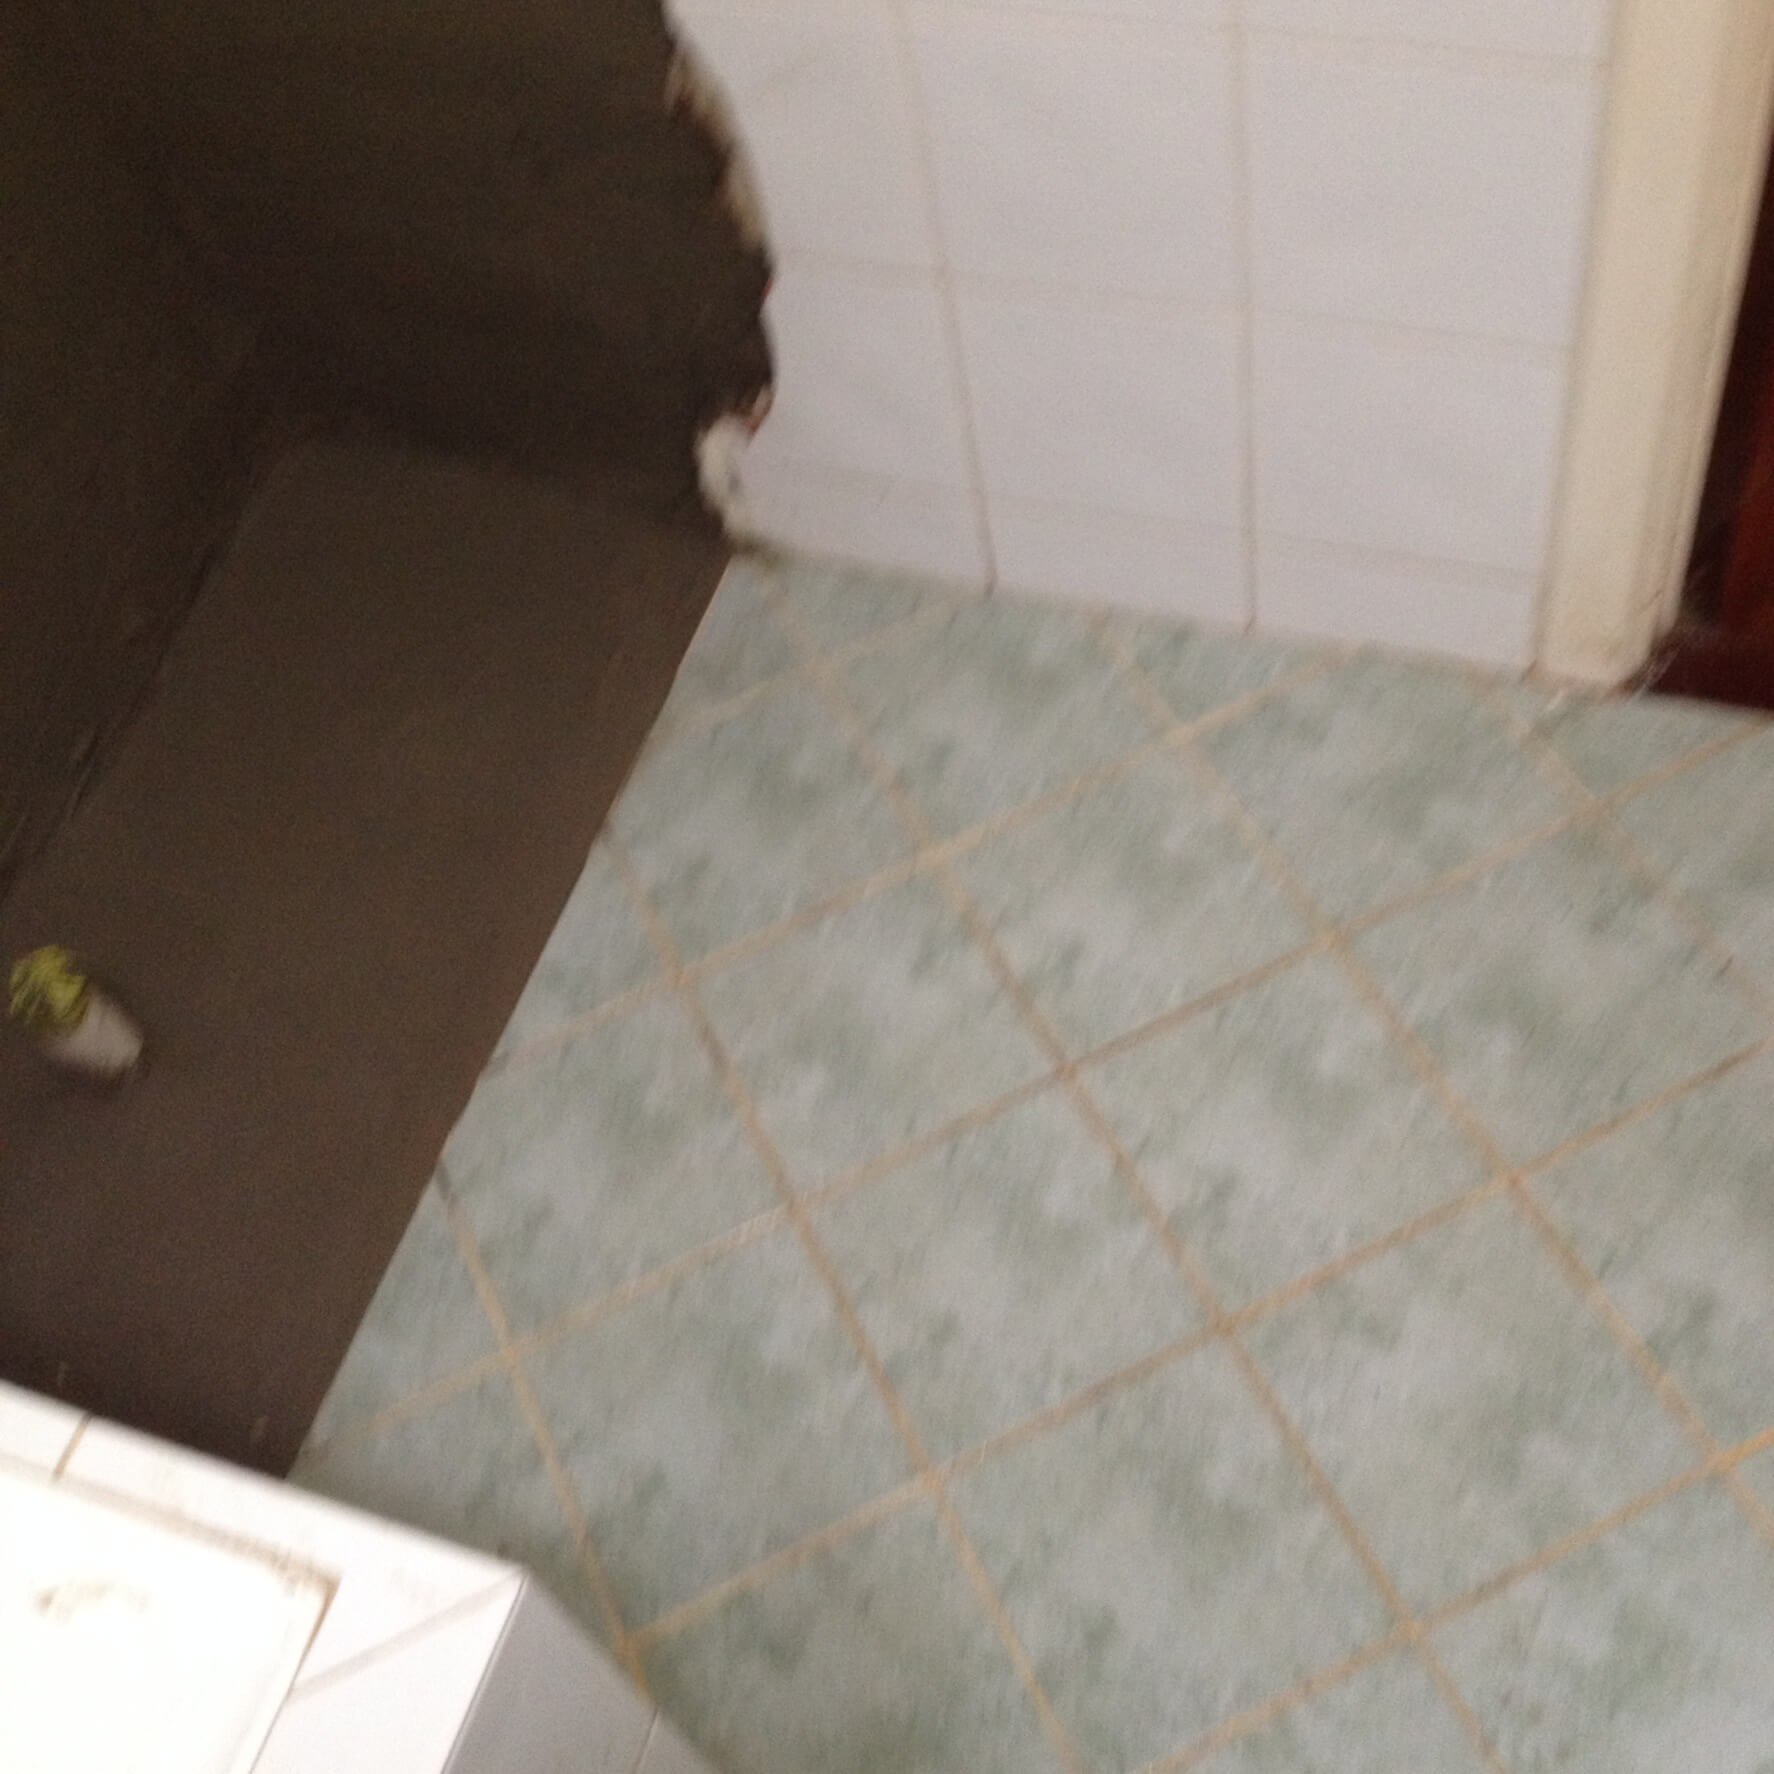 Everyday Plumbers Residential Vanity Basin Repairs - Basin Installation Setup 0405